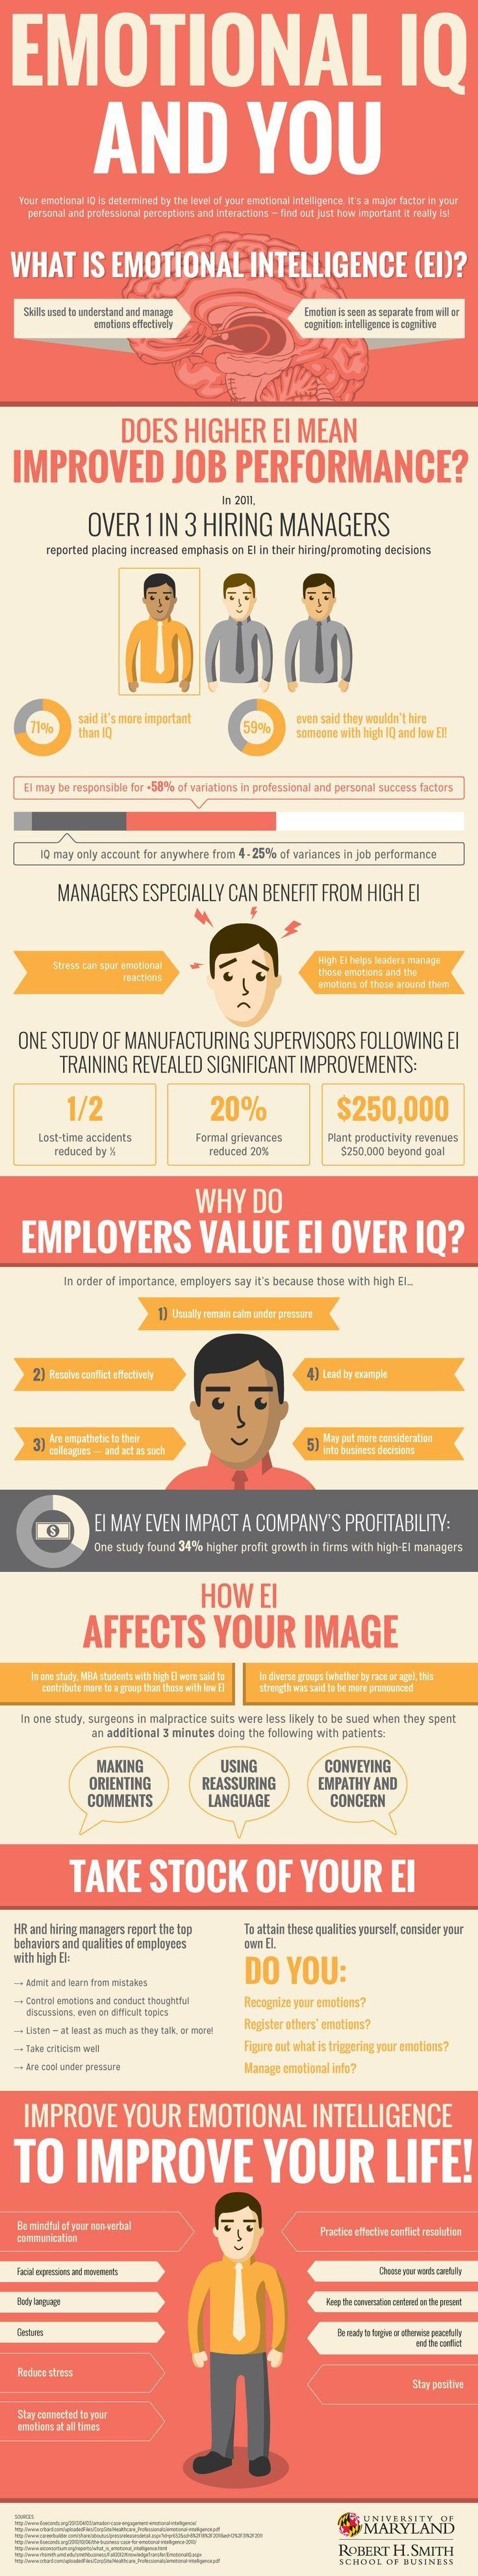 Infografik Emotionale Intelligenz von University of Maryland.